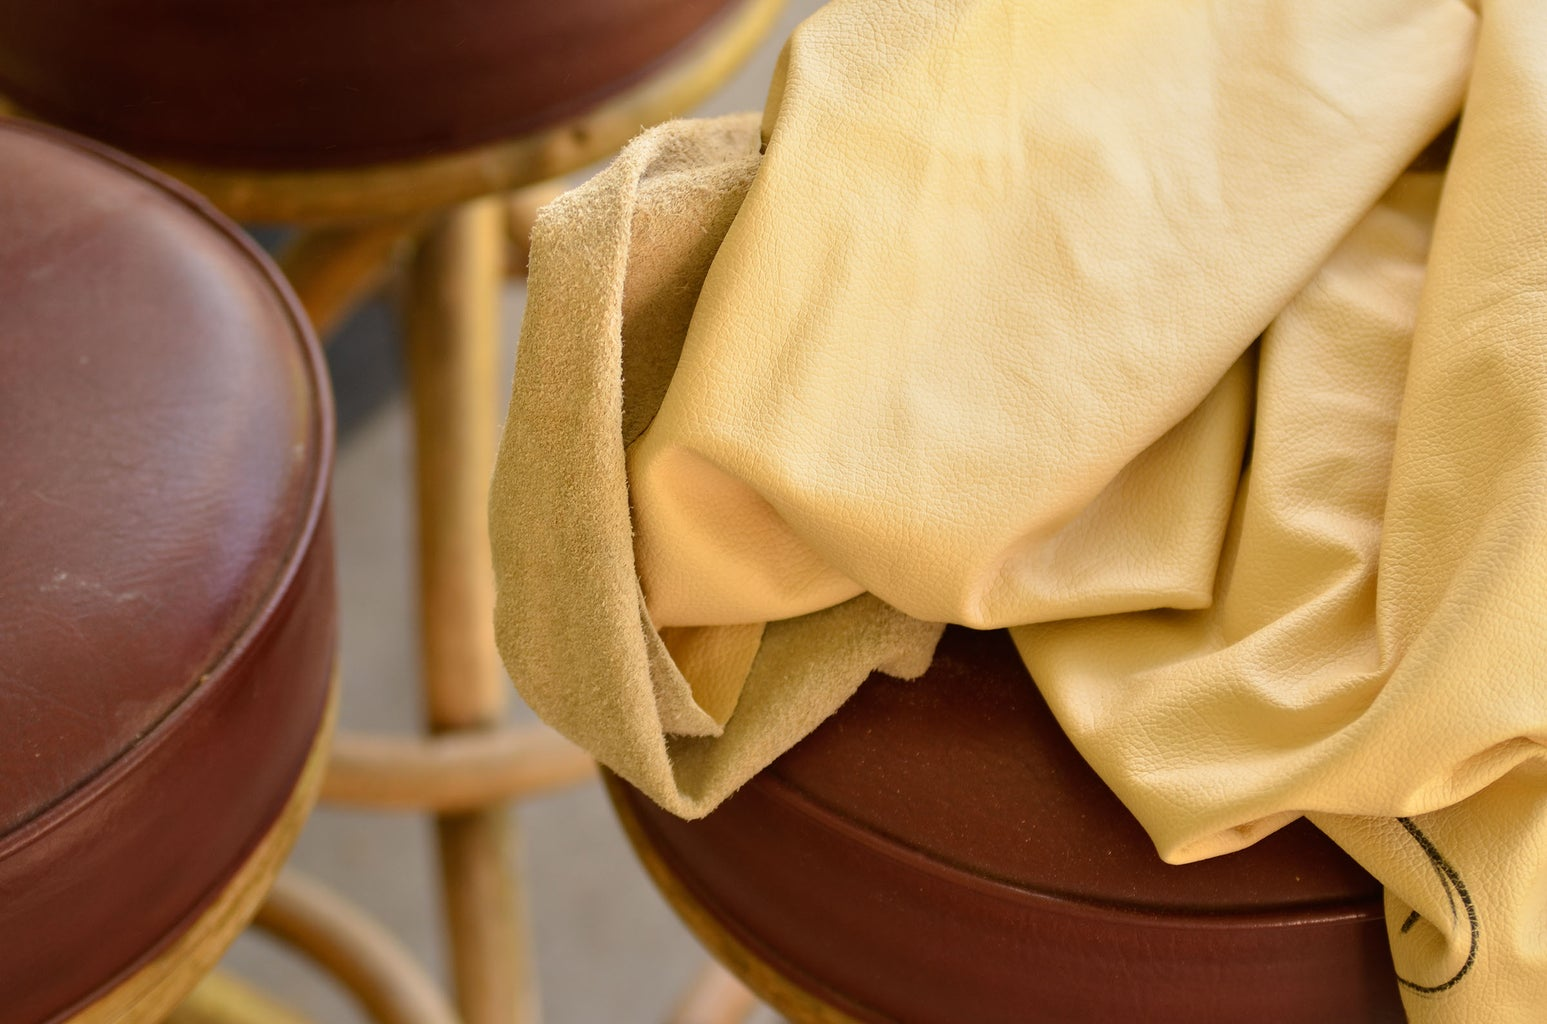 Obtain Glue, Leather, Cardboard